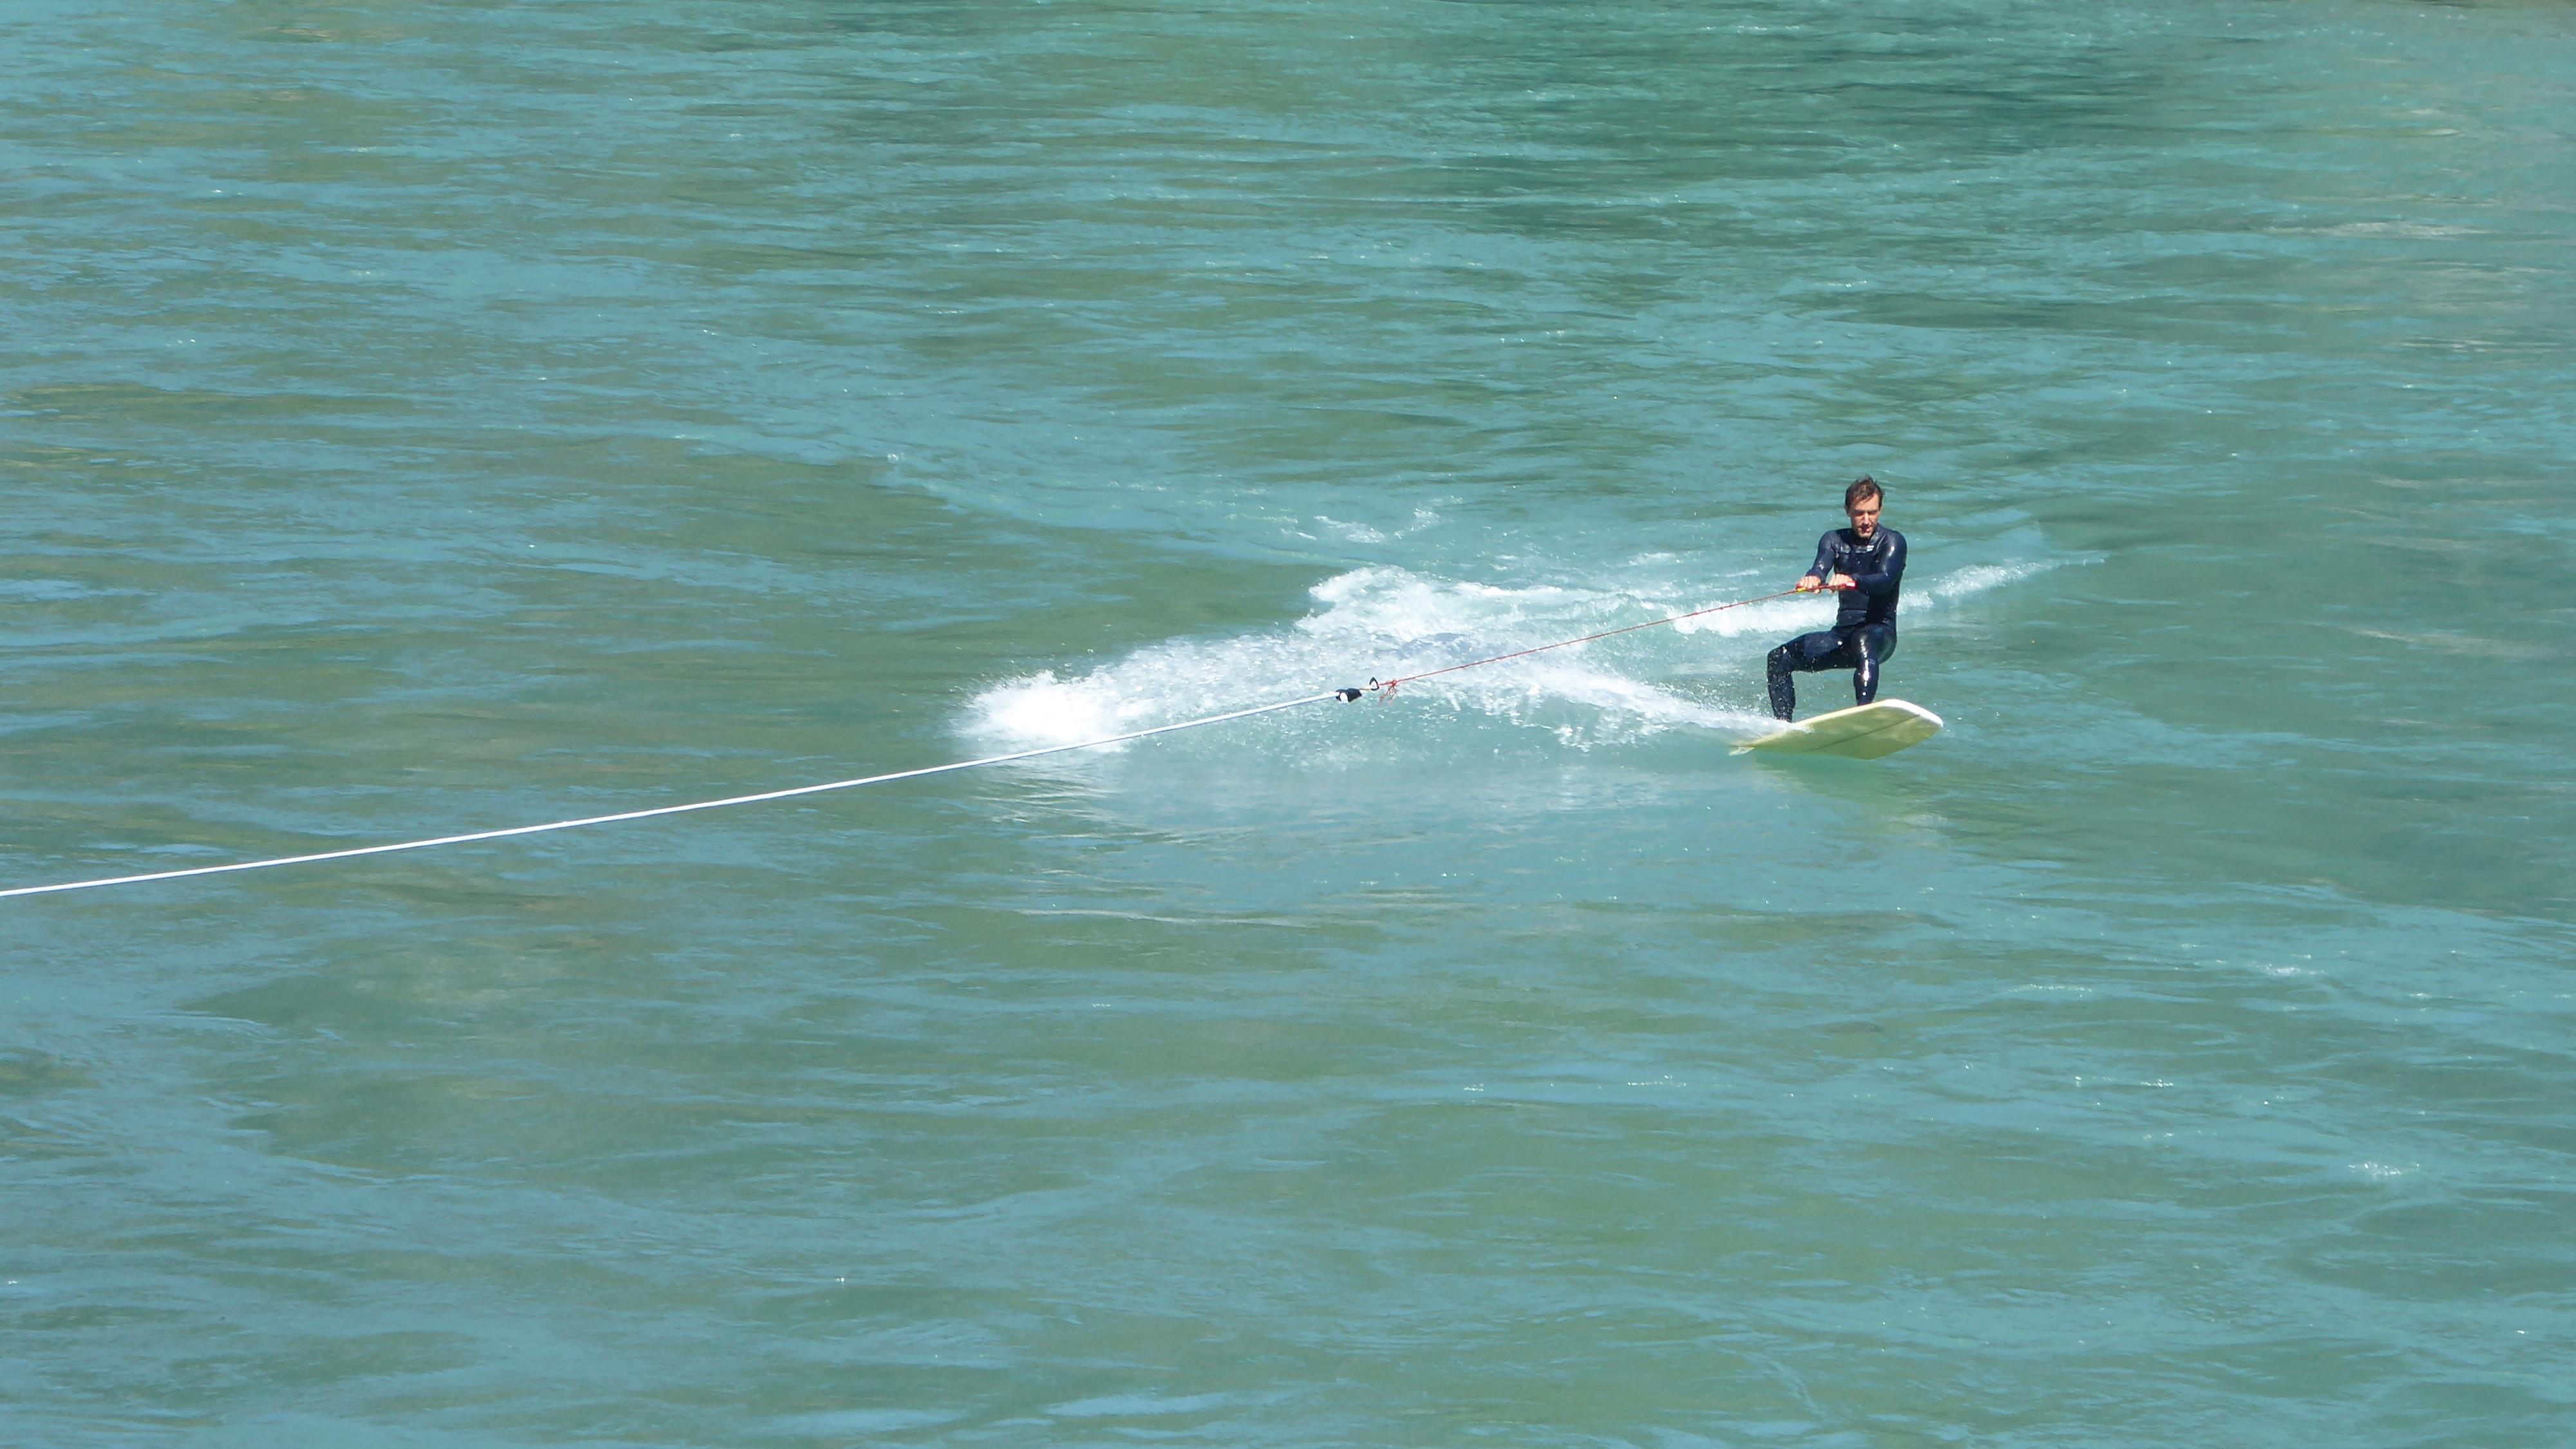 200707_wakeboard_4